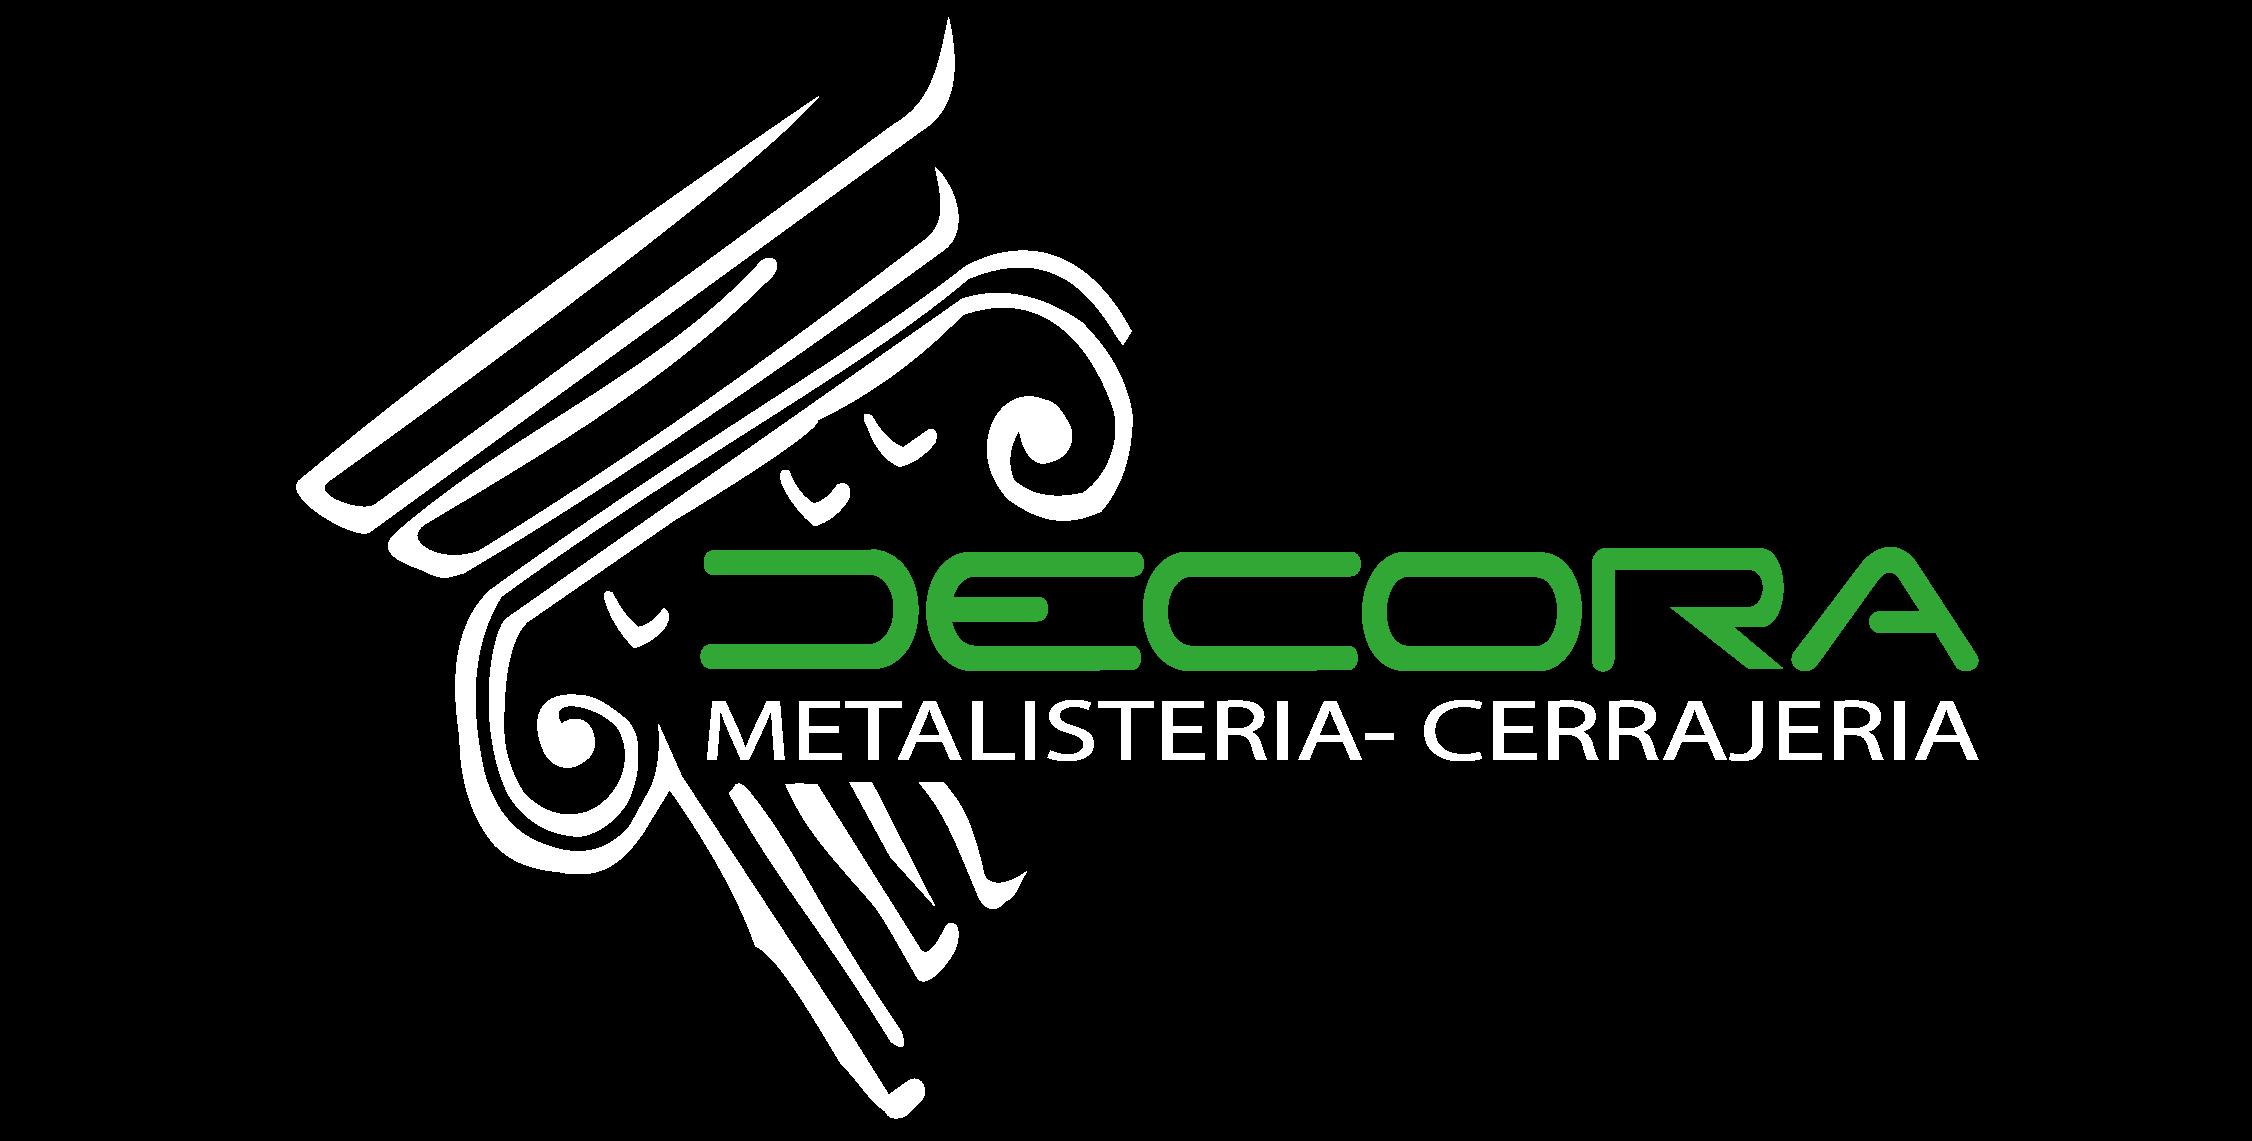 Decorasa Metalisteria